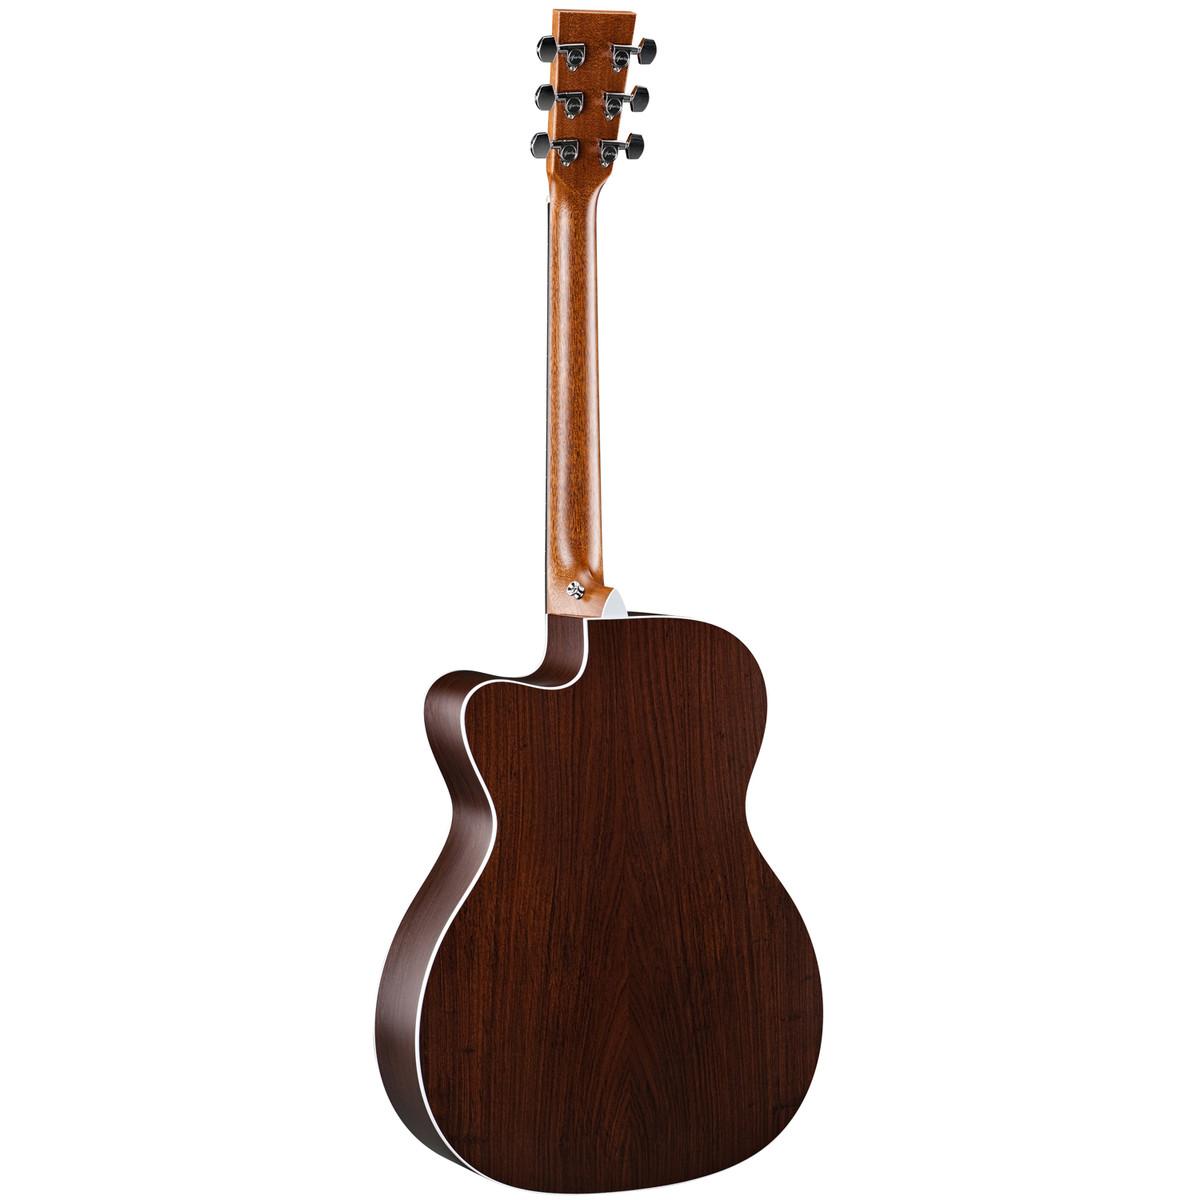 martin omcpa4 spectacle artiste electro acoustique guitare. Black Bedroom Furniture Sets. Home Design Ideas